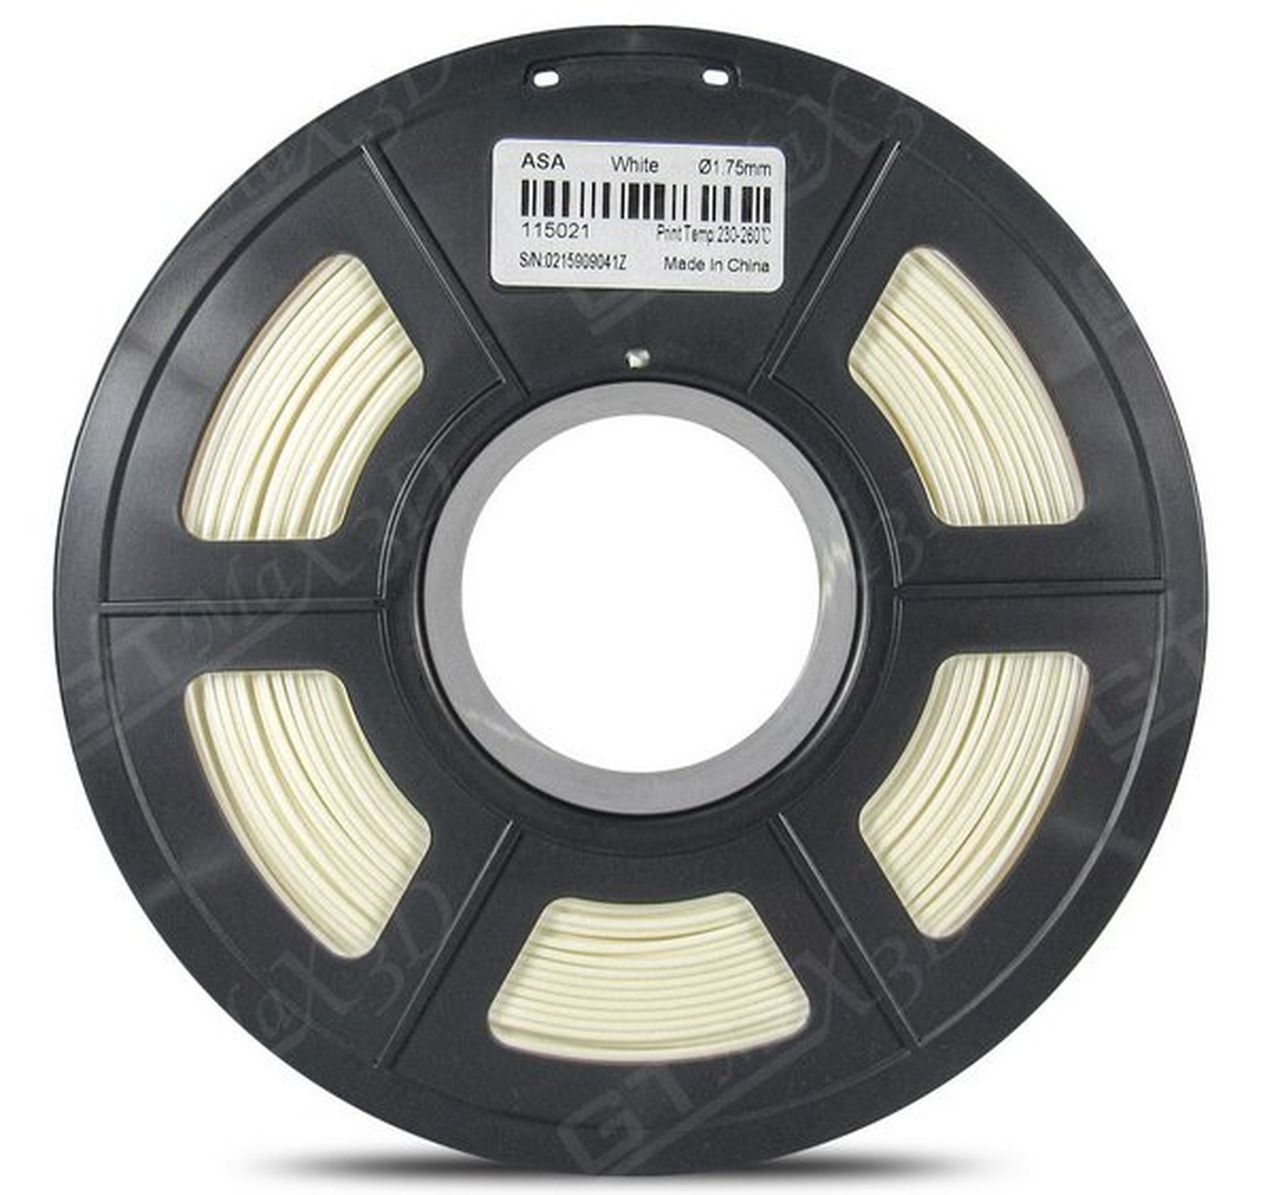 Filamento ASA - Branco - GTMax 3D - 1.75 mm - 1 KG